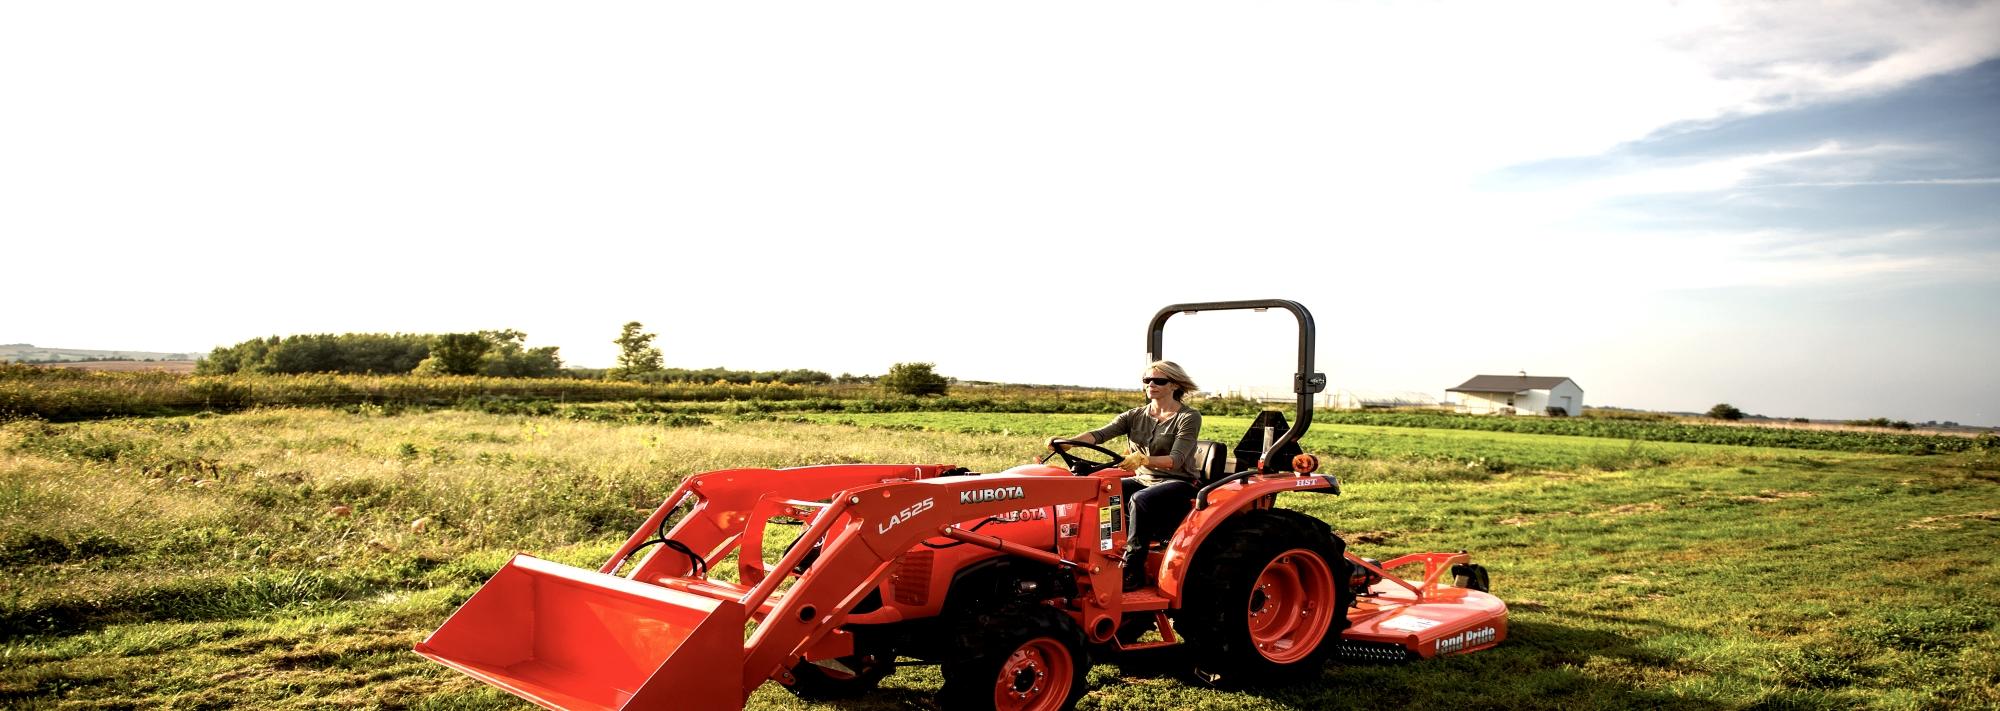 New Holland farm and construction equipment, Kubota and